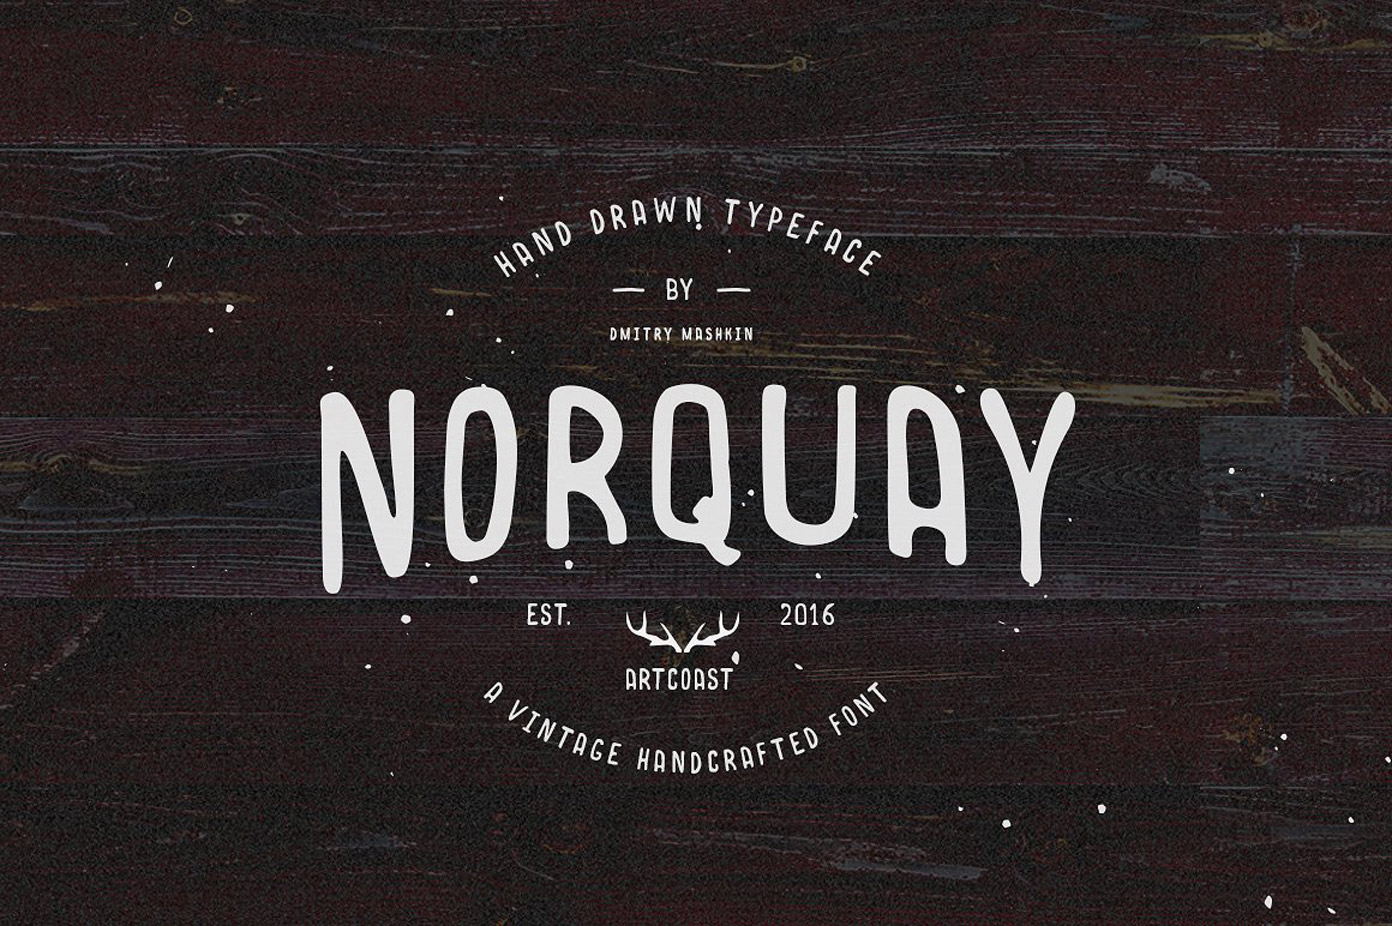 Norquay Typeface